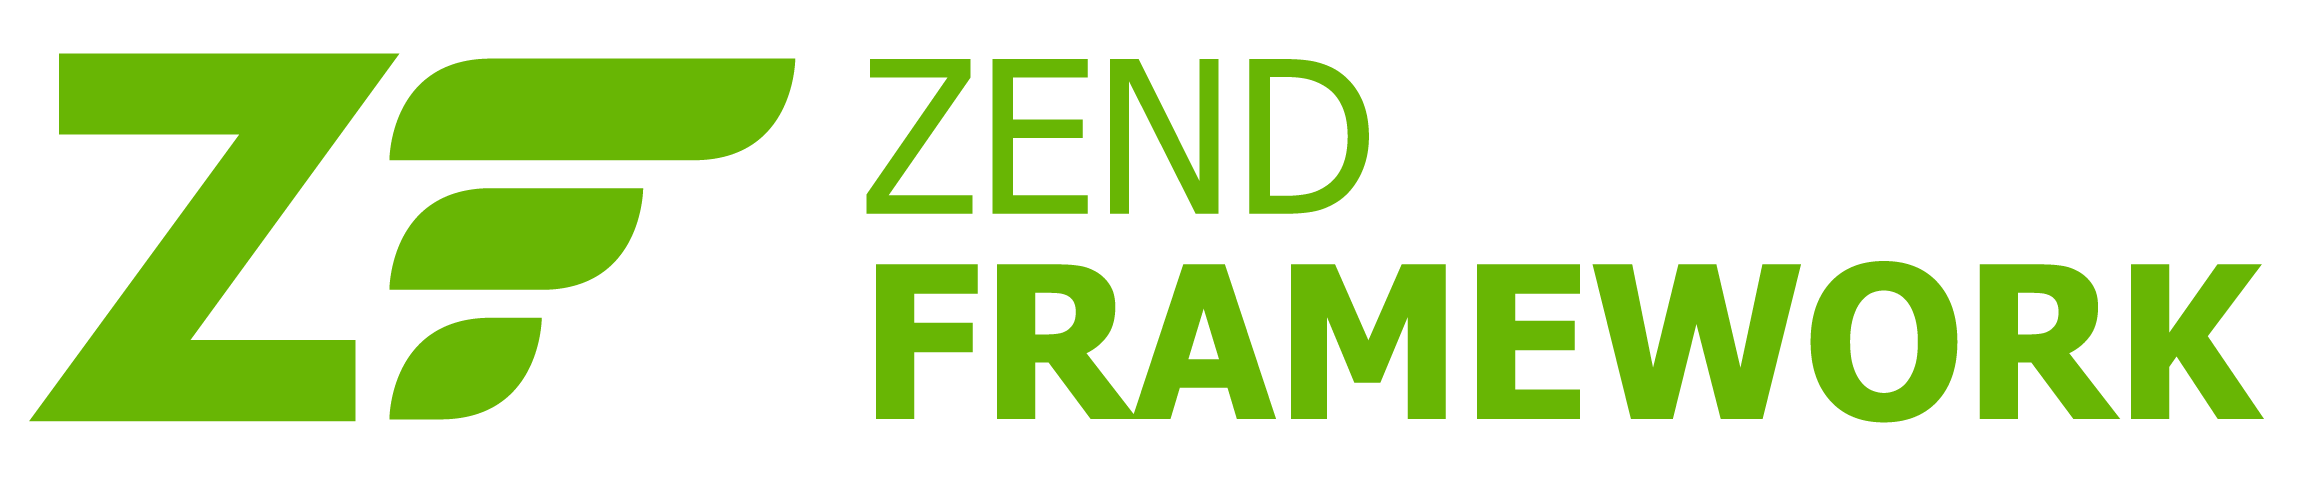 ZendFramework-logo.png